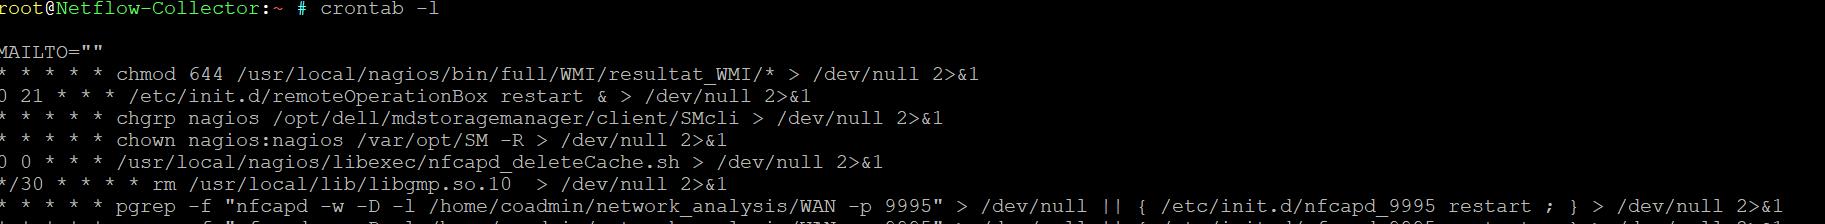 netflow crontab debug